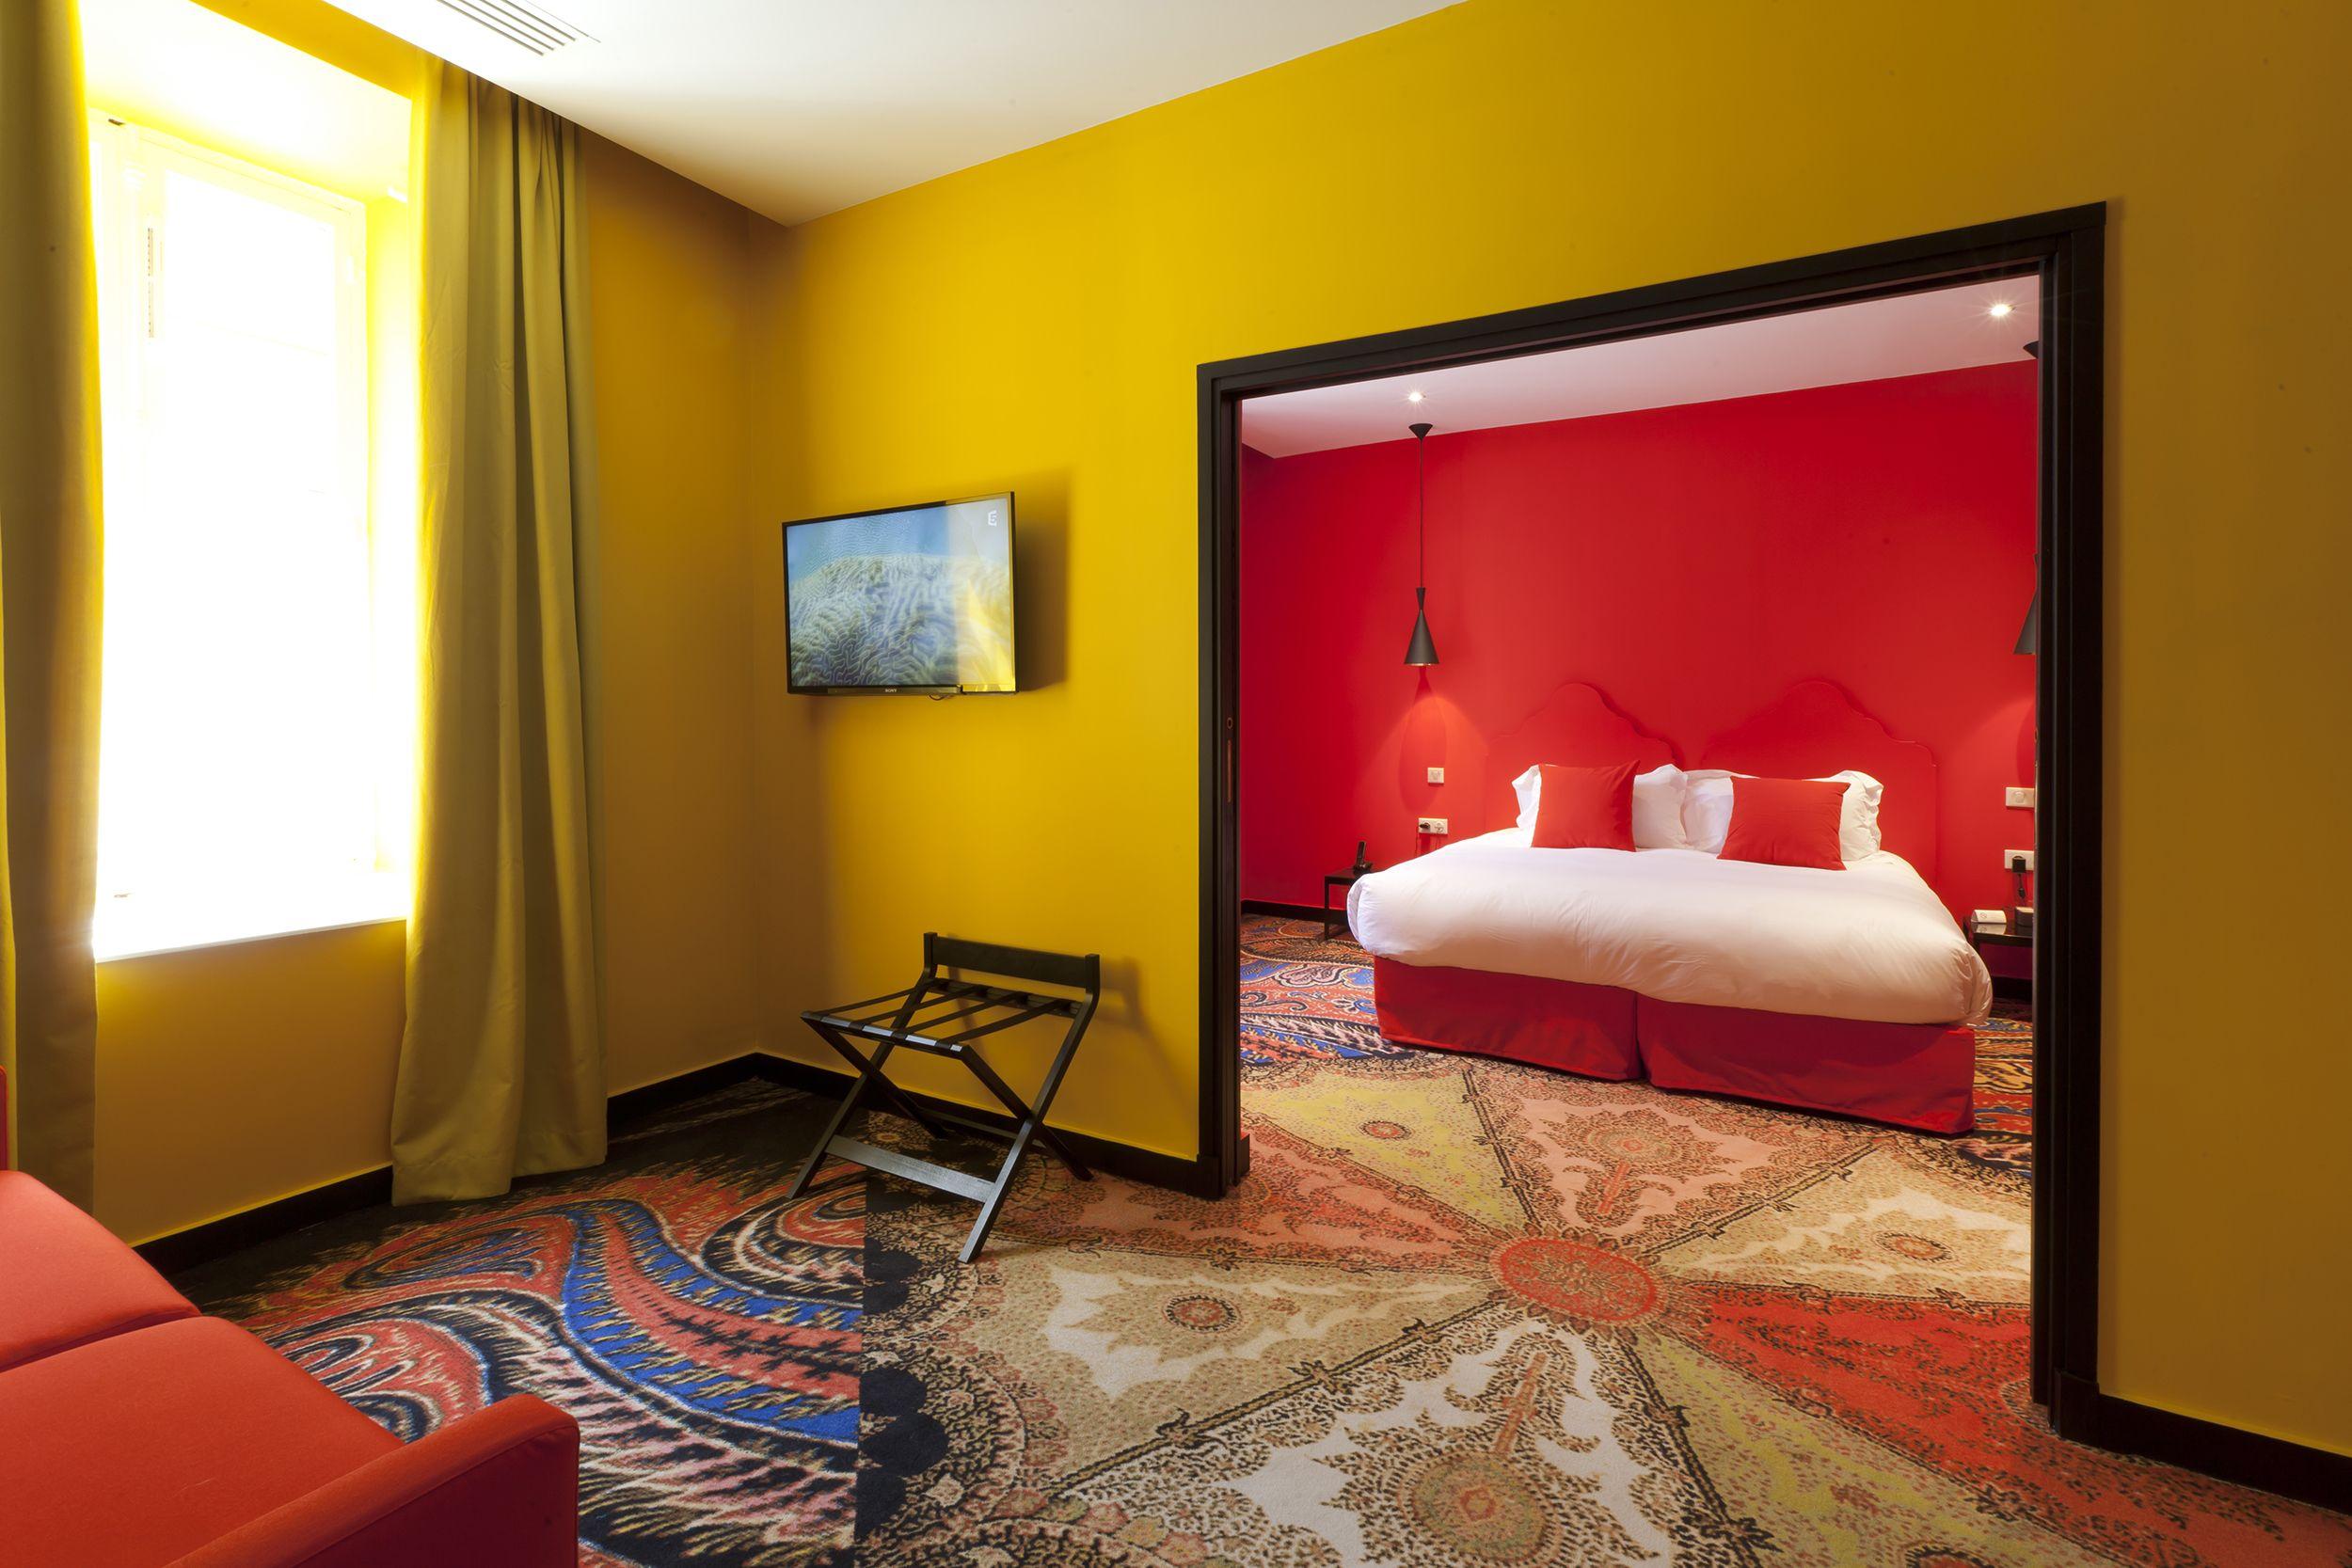 Location hotel jules c sar france carpet design by mr Hotel christian lacroix